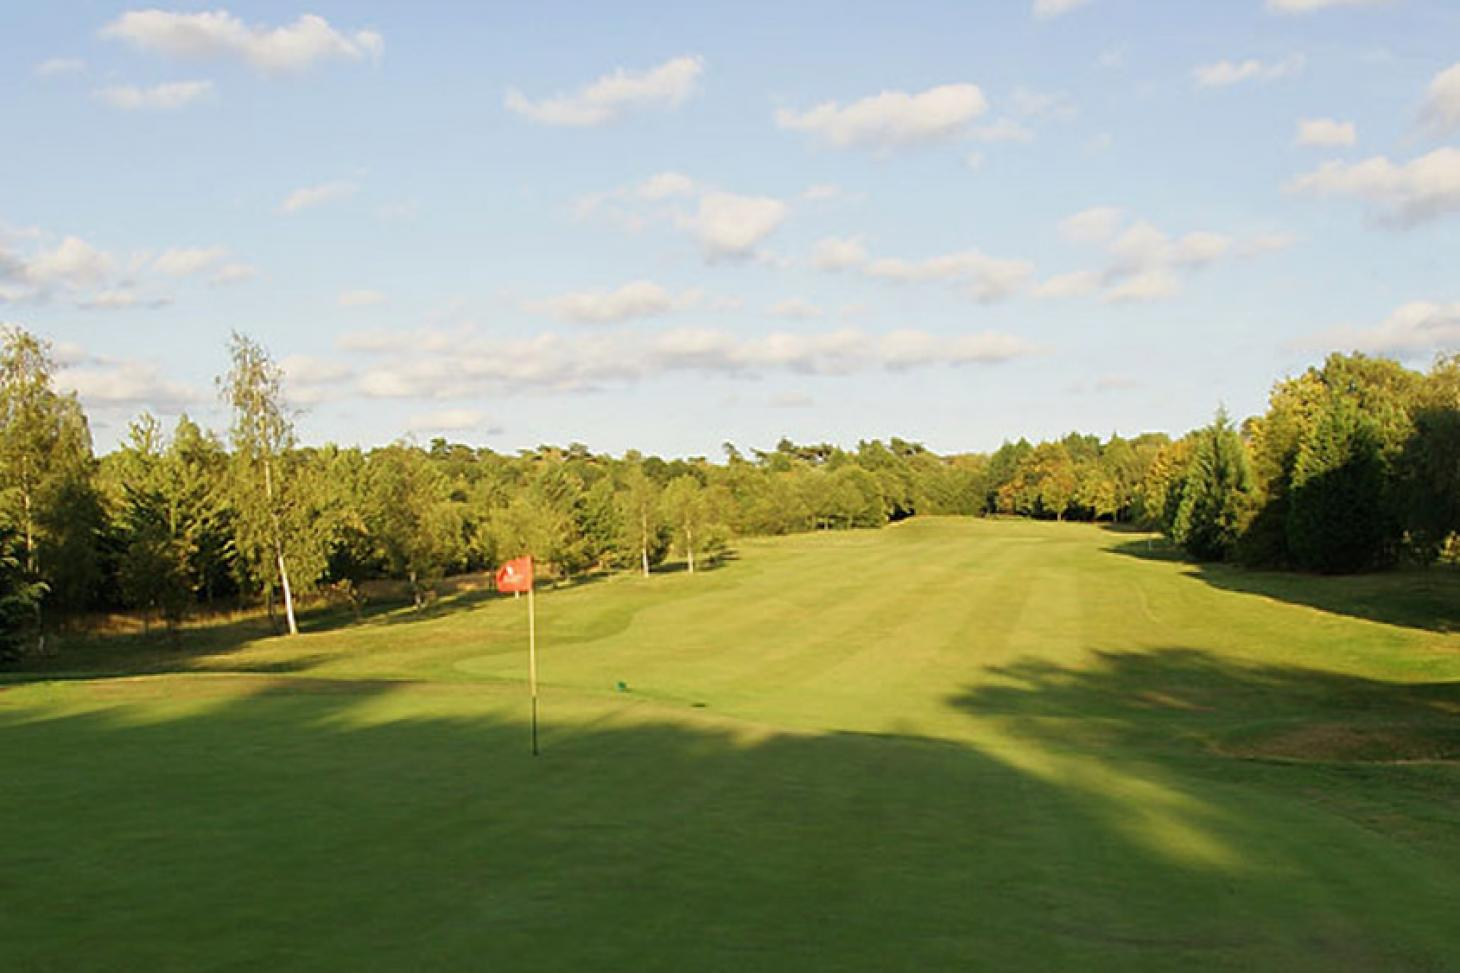 Woodcote Park Golf Club 18 hole golf course